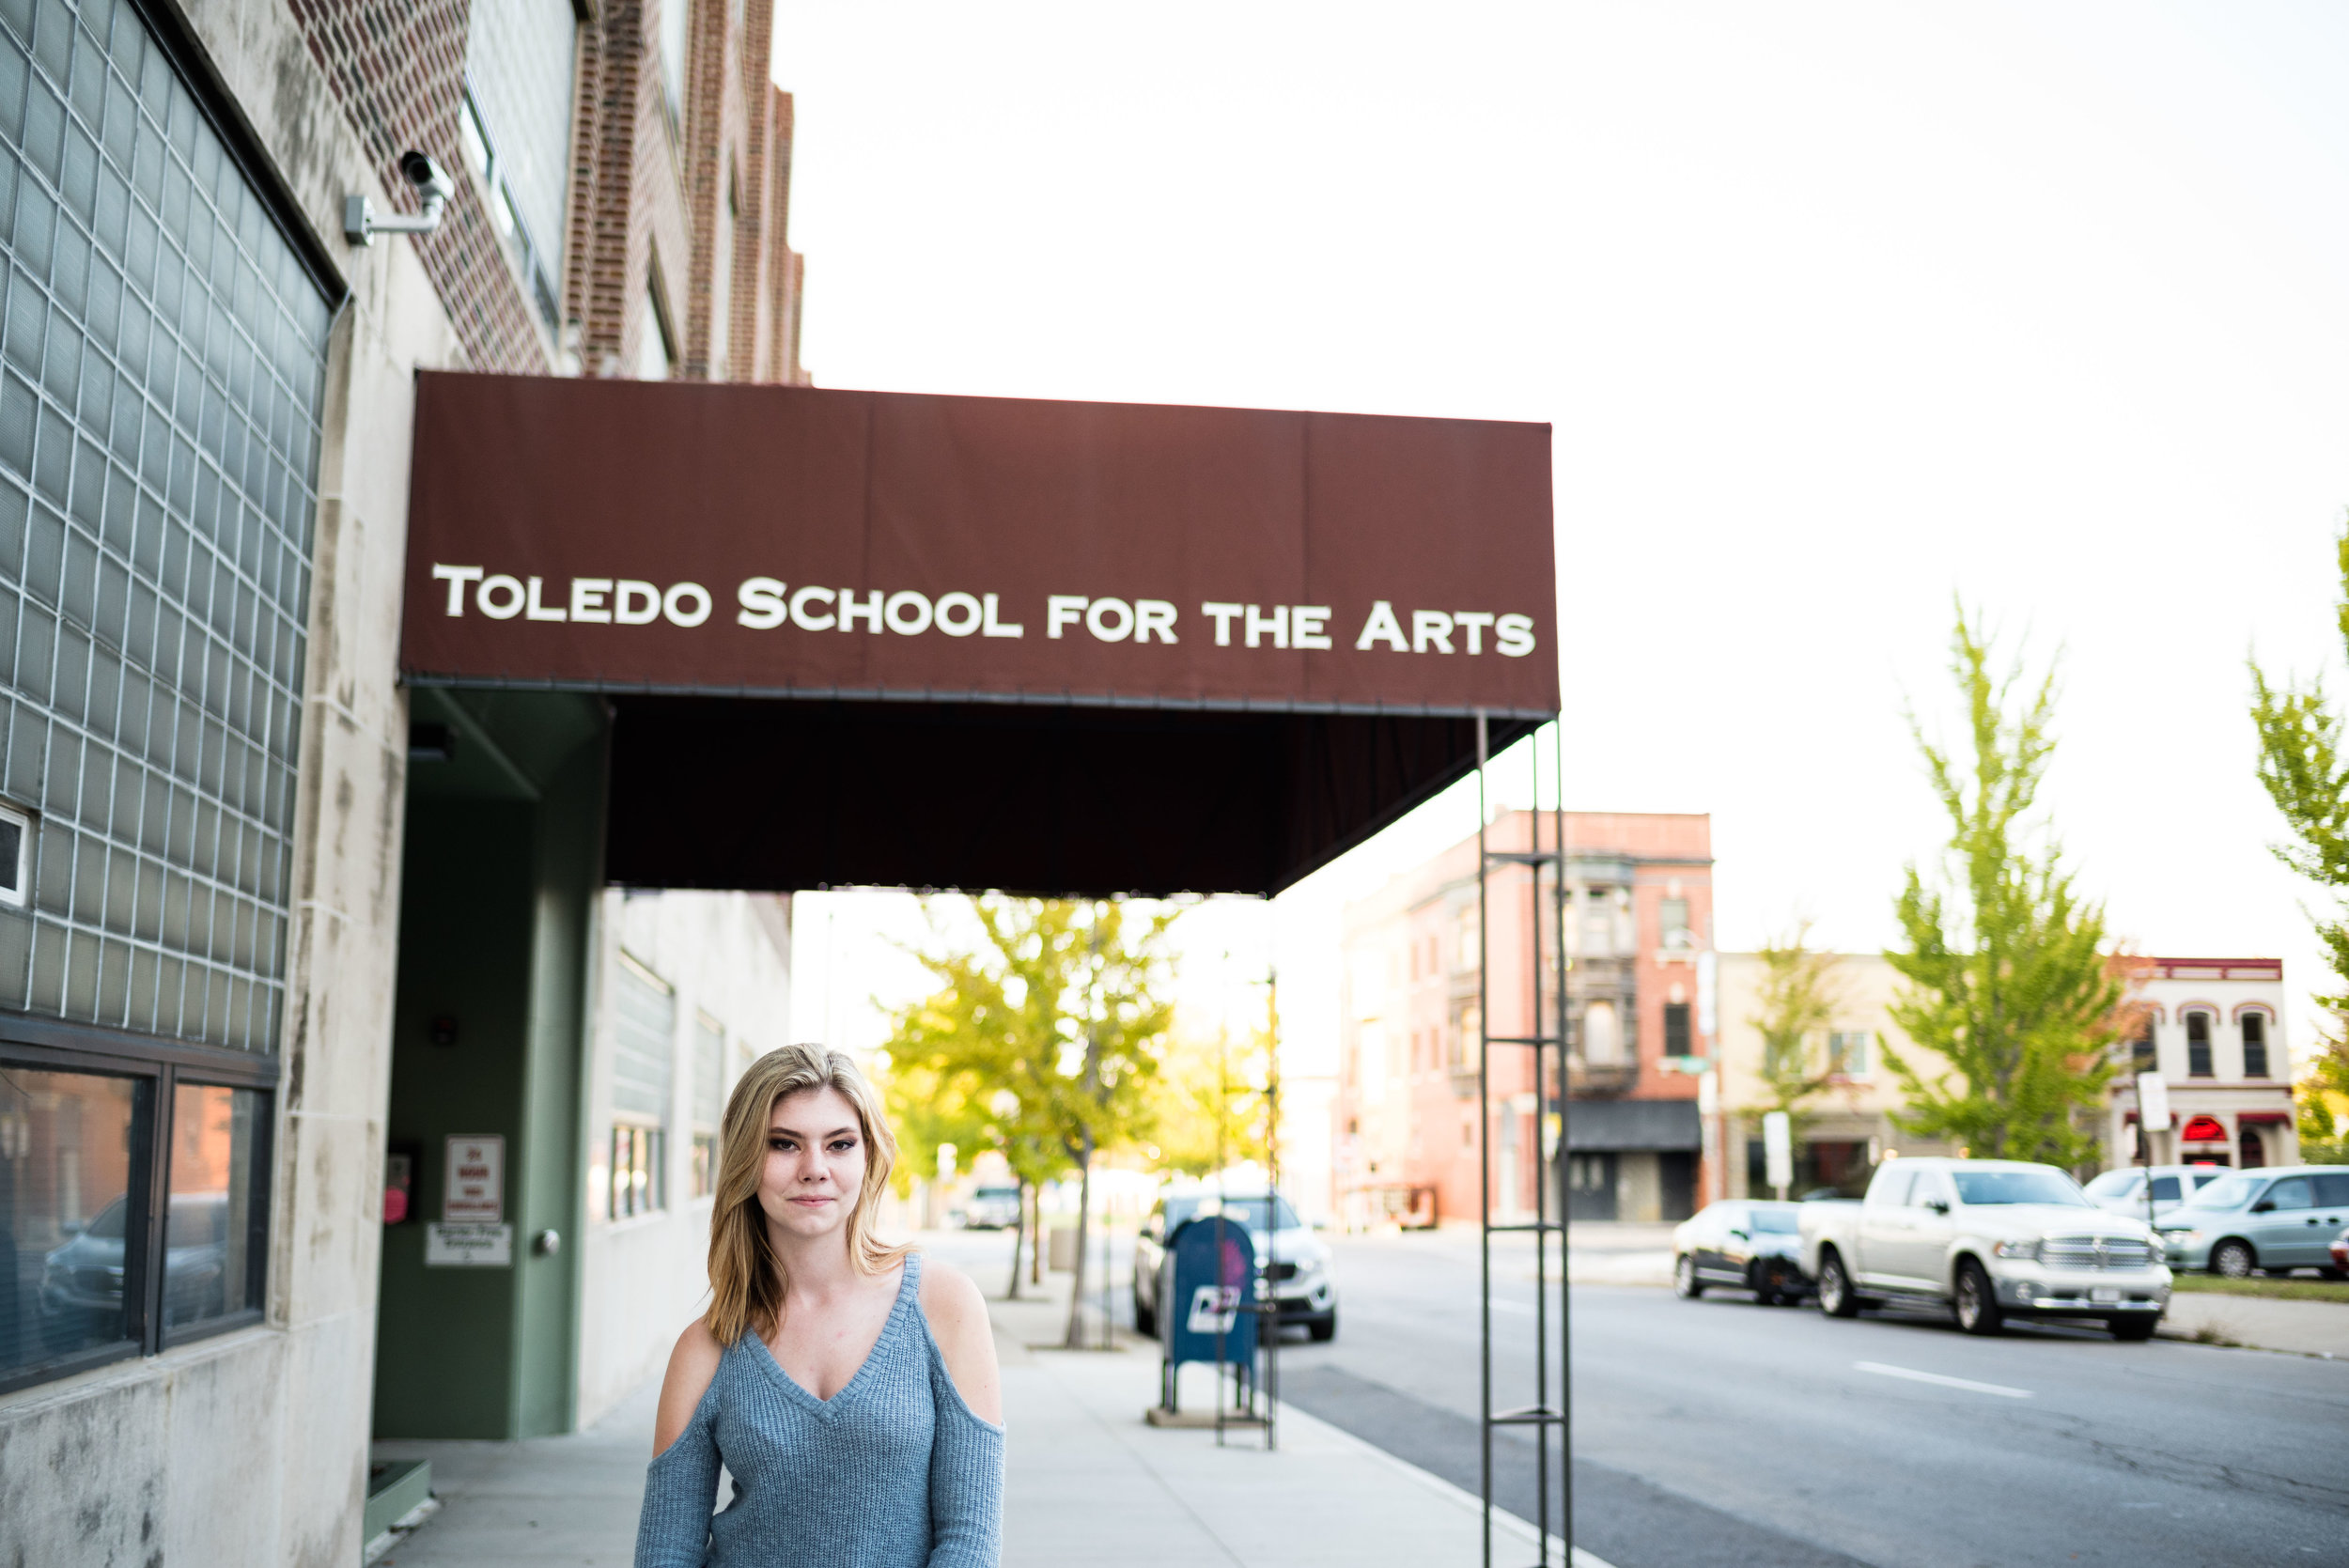 toledo school for the arts senior